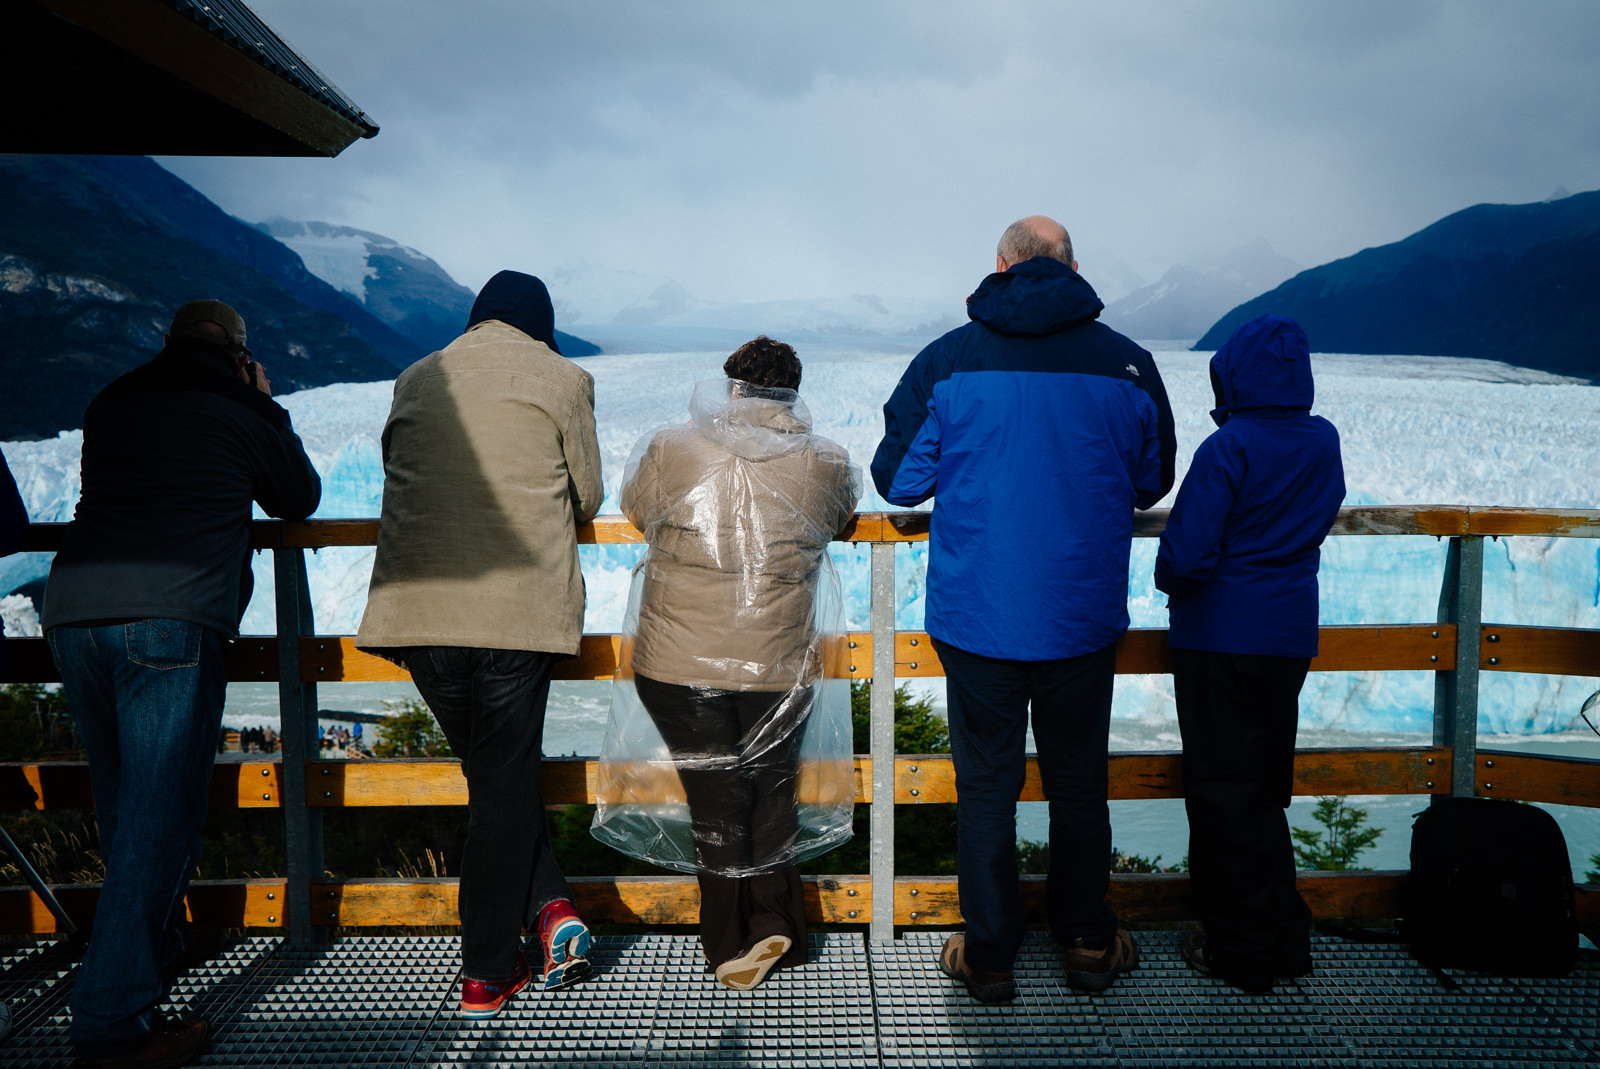 wrenee-perito-moreno-glacier-patagonia-argentina-3.jpg